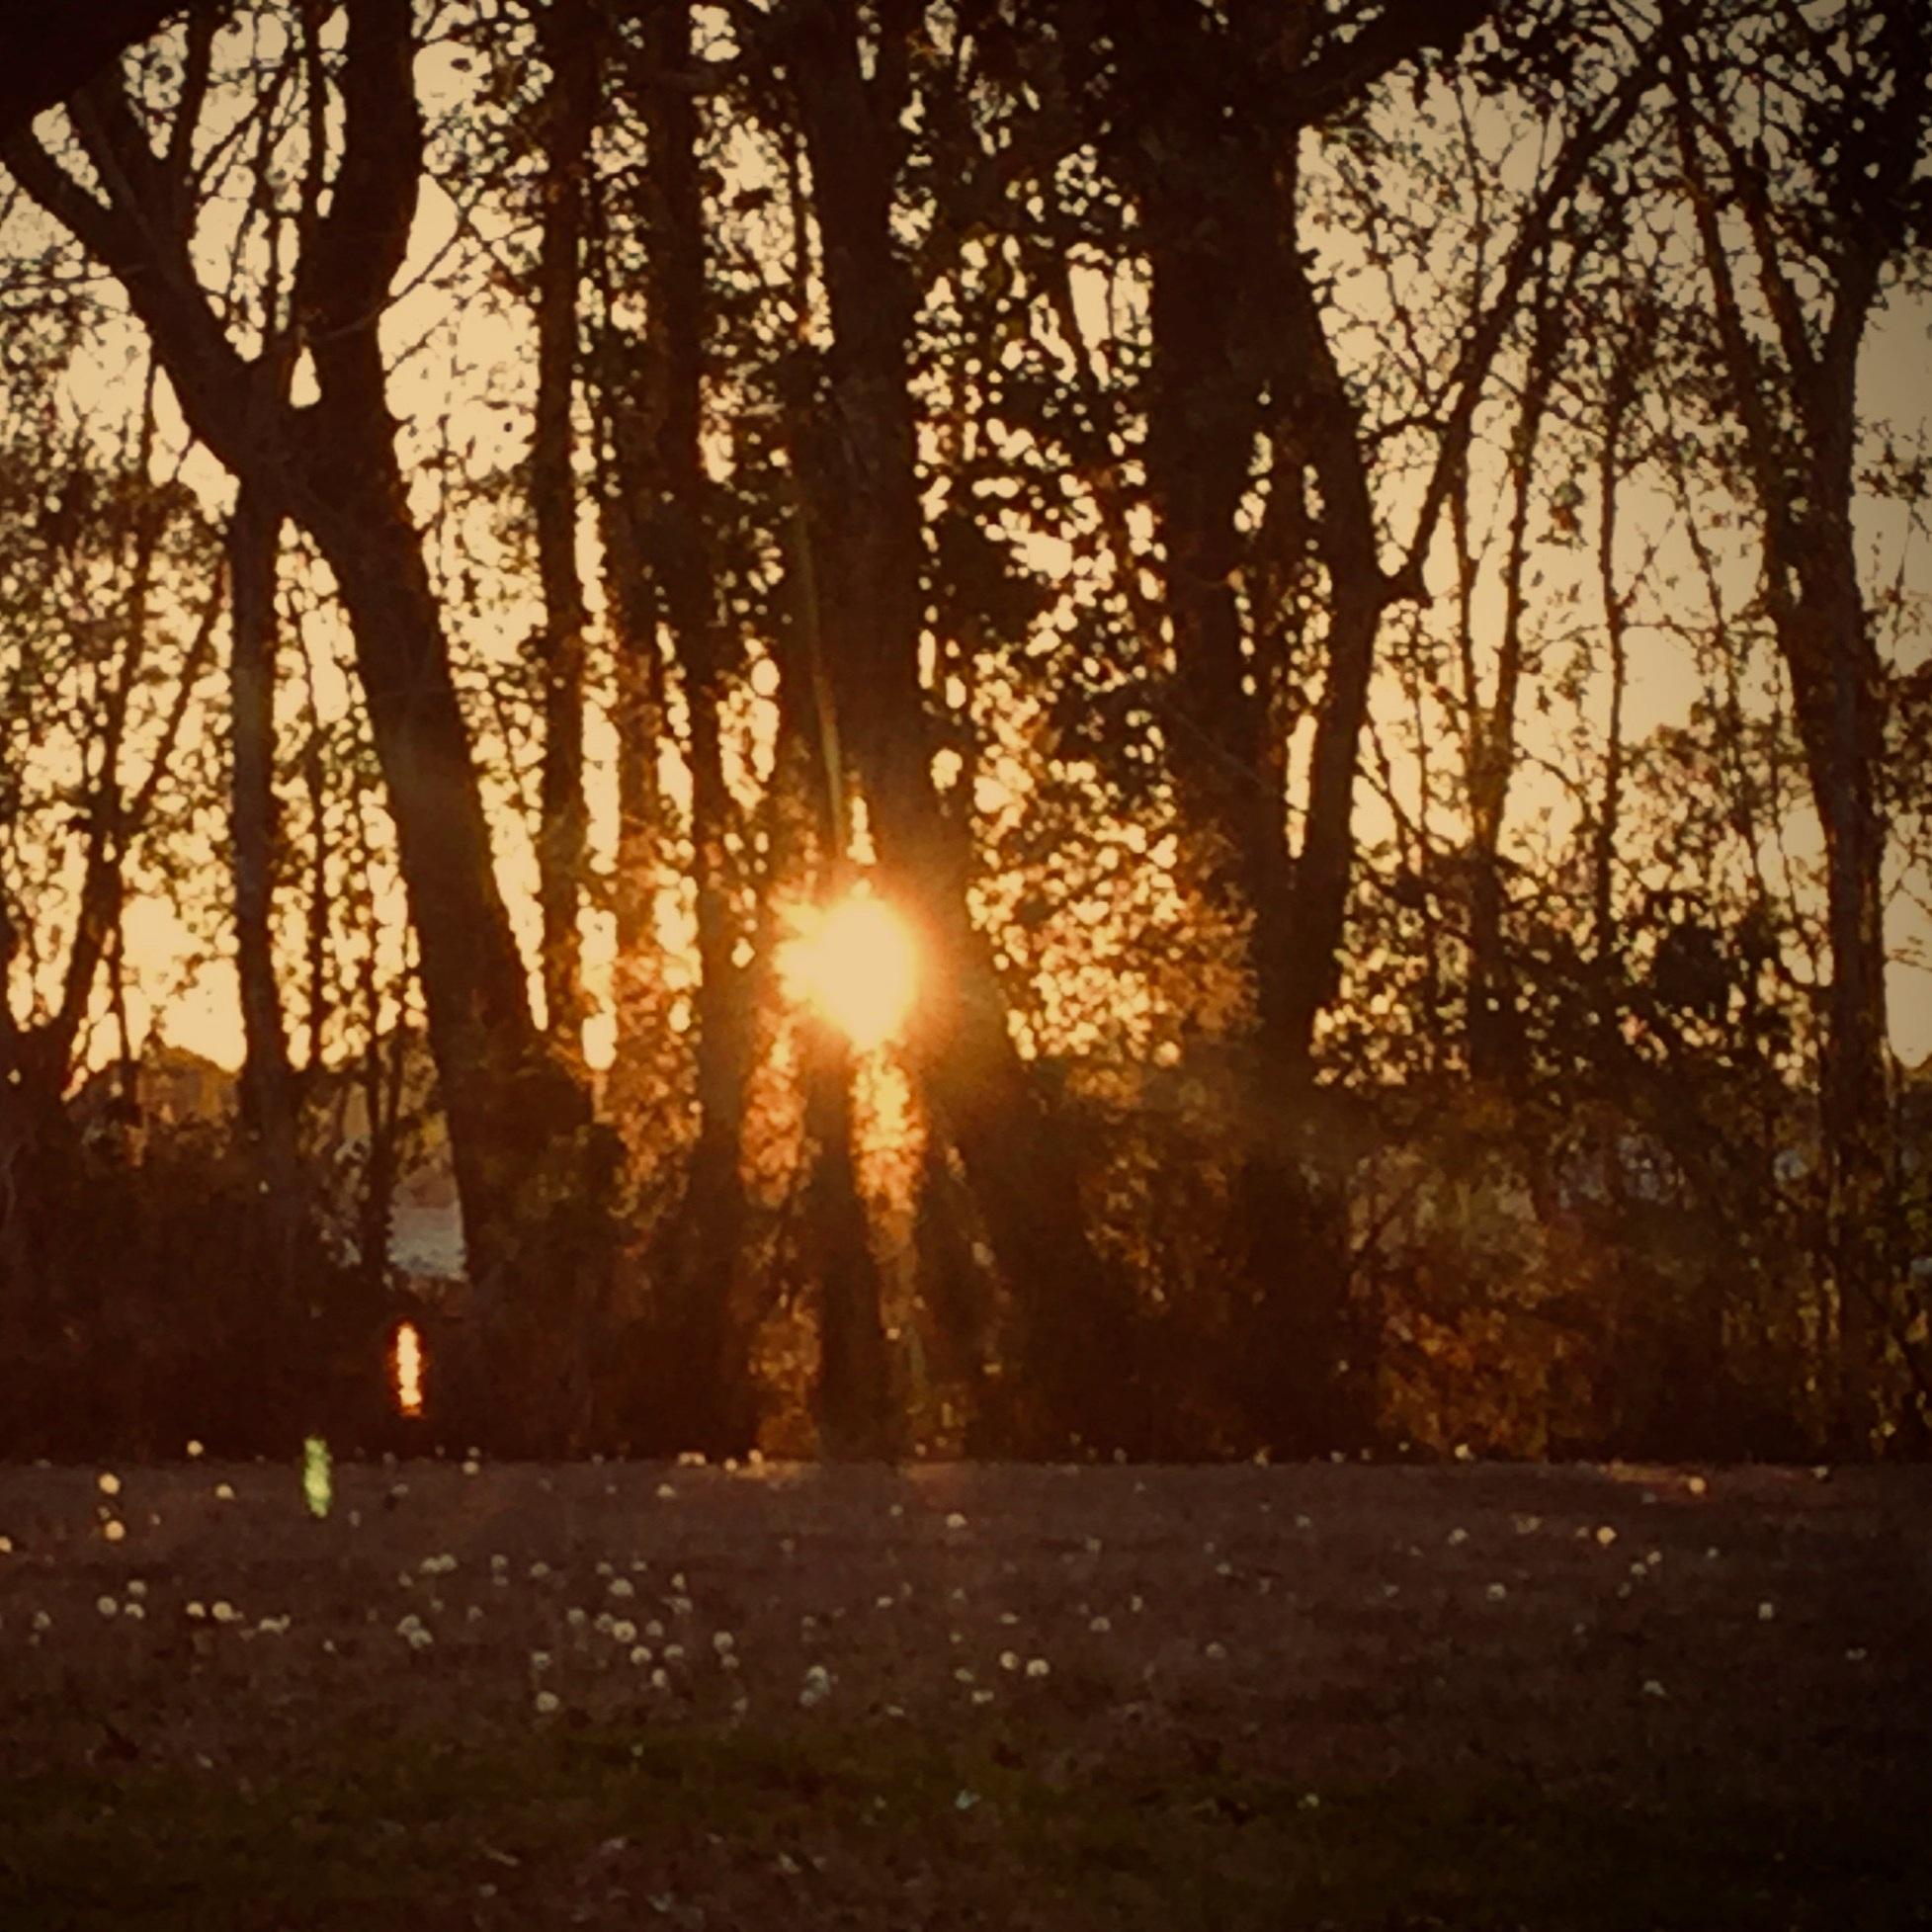 Sunset+study+through+trees.jpg